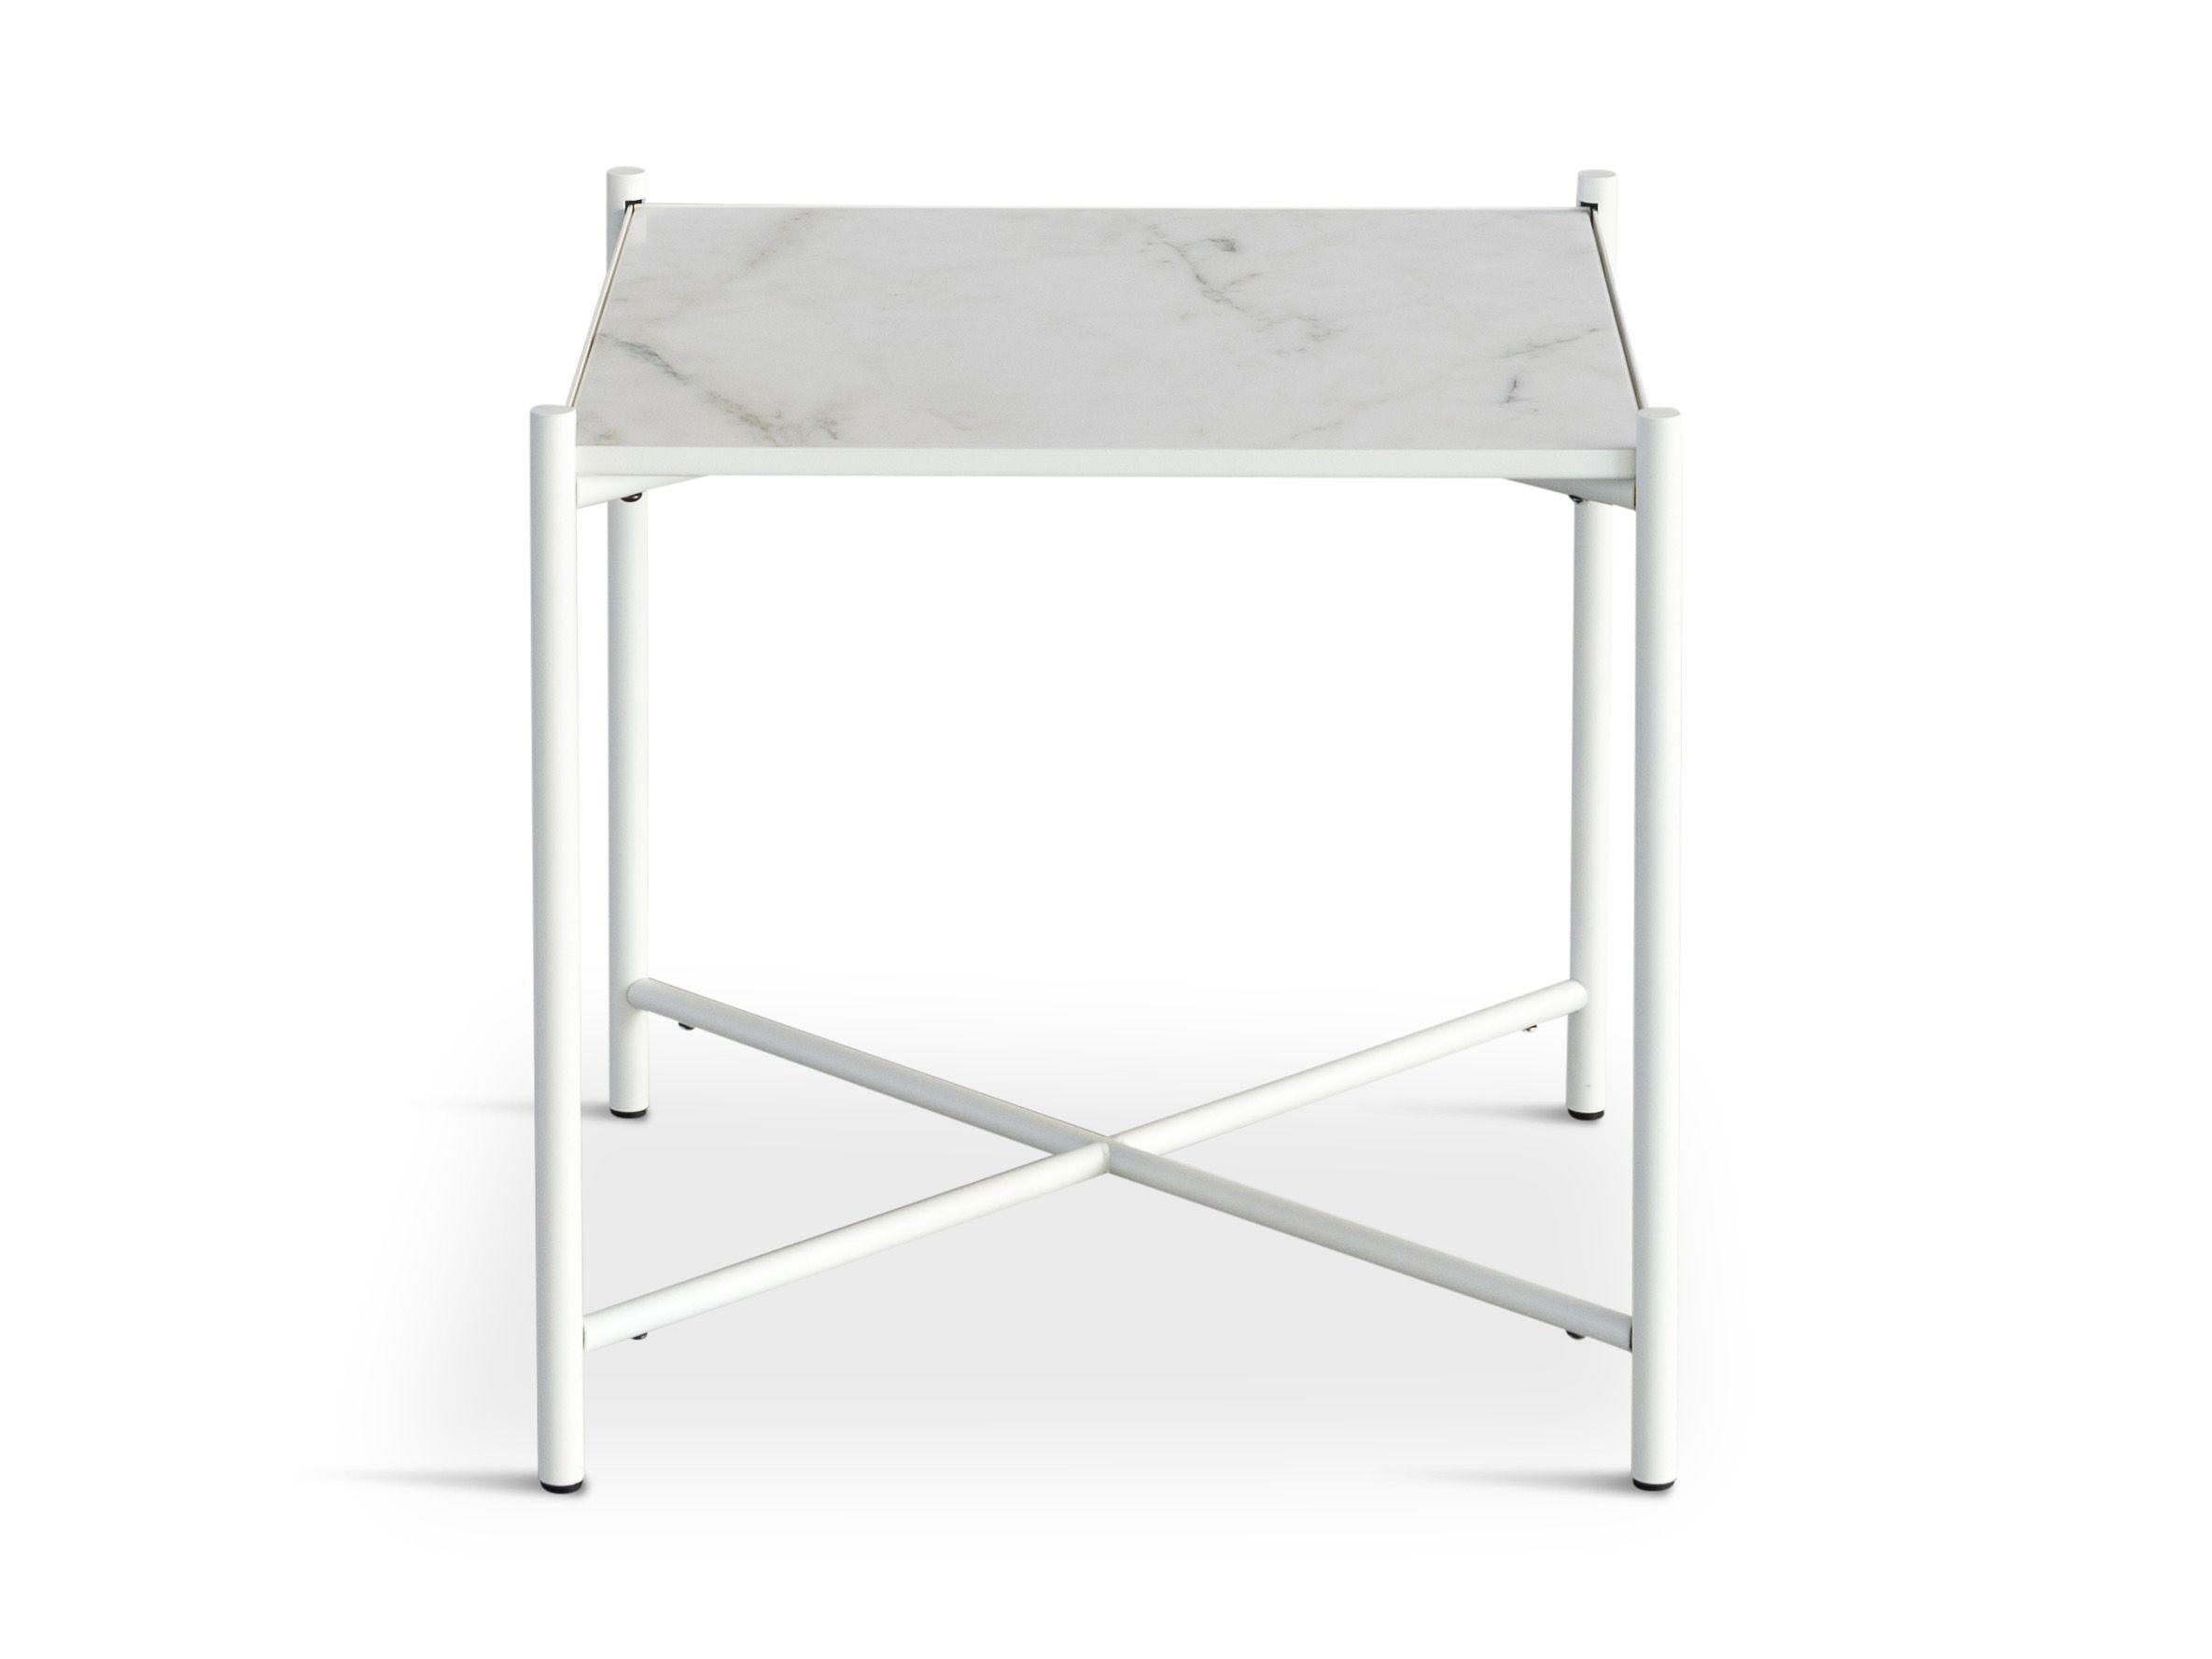 HANDVÄRK - Sidebord 48x48 - Hvid Marmor, hvid stel - Hvidt sidebord med hvid marmor